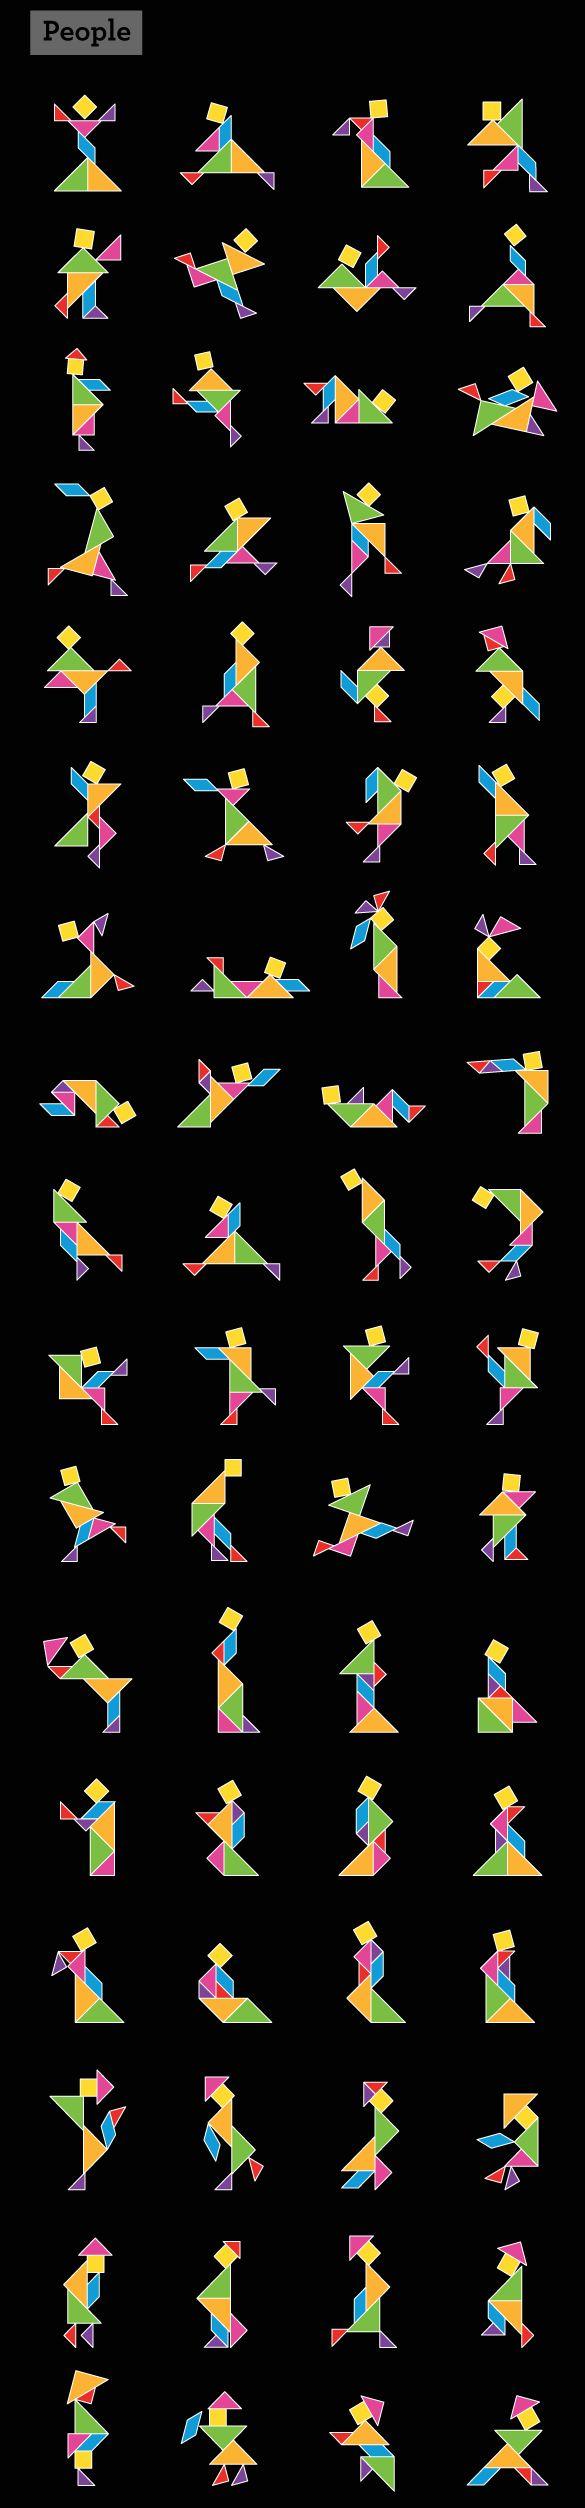 WALLS 360 BLOG » Wall Tangrams: Shapes Guide I (Multi-Color)